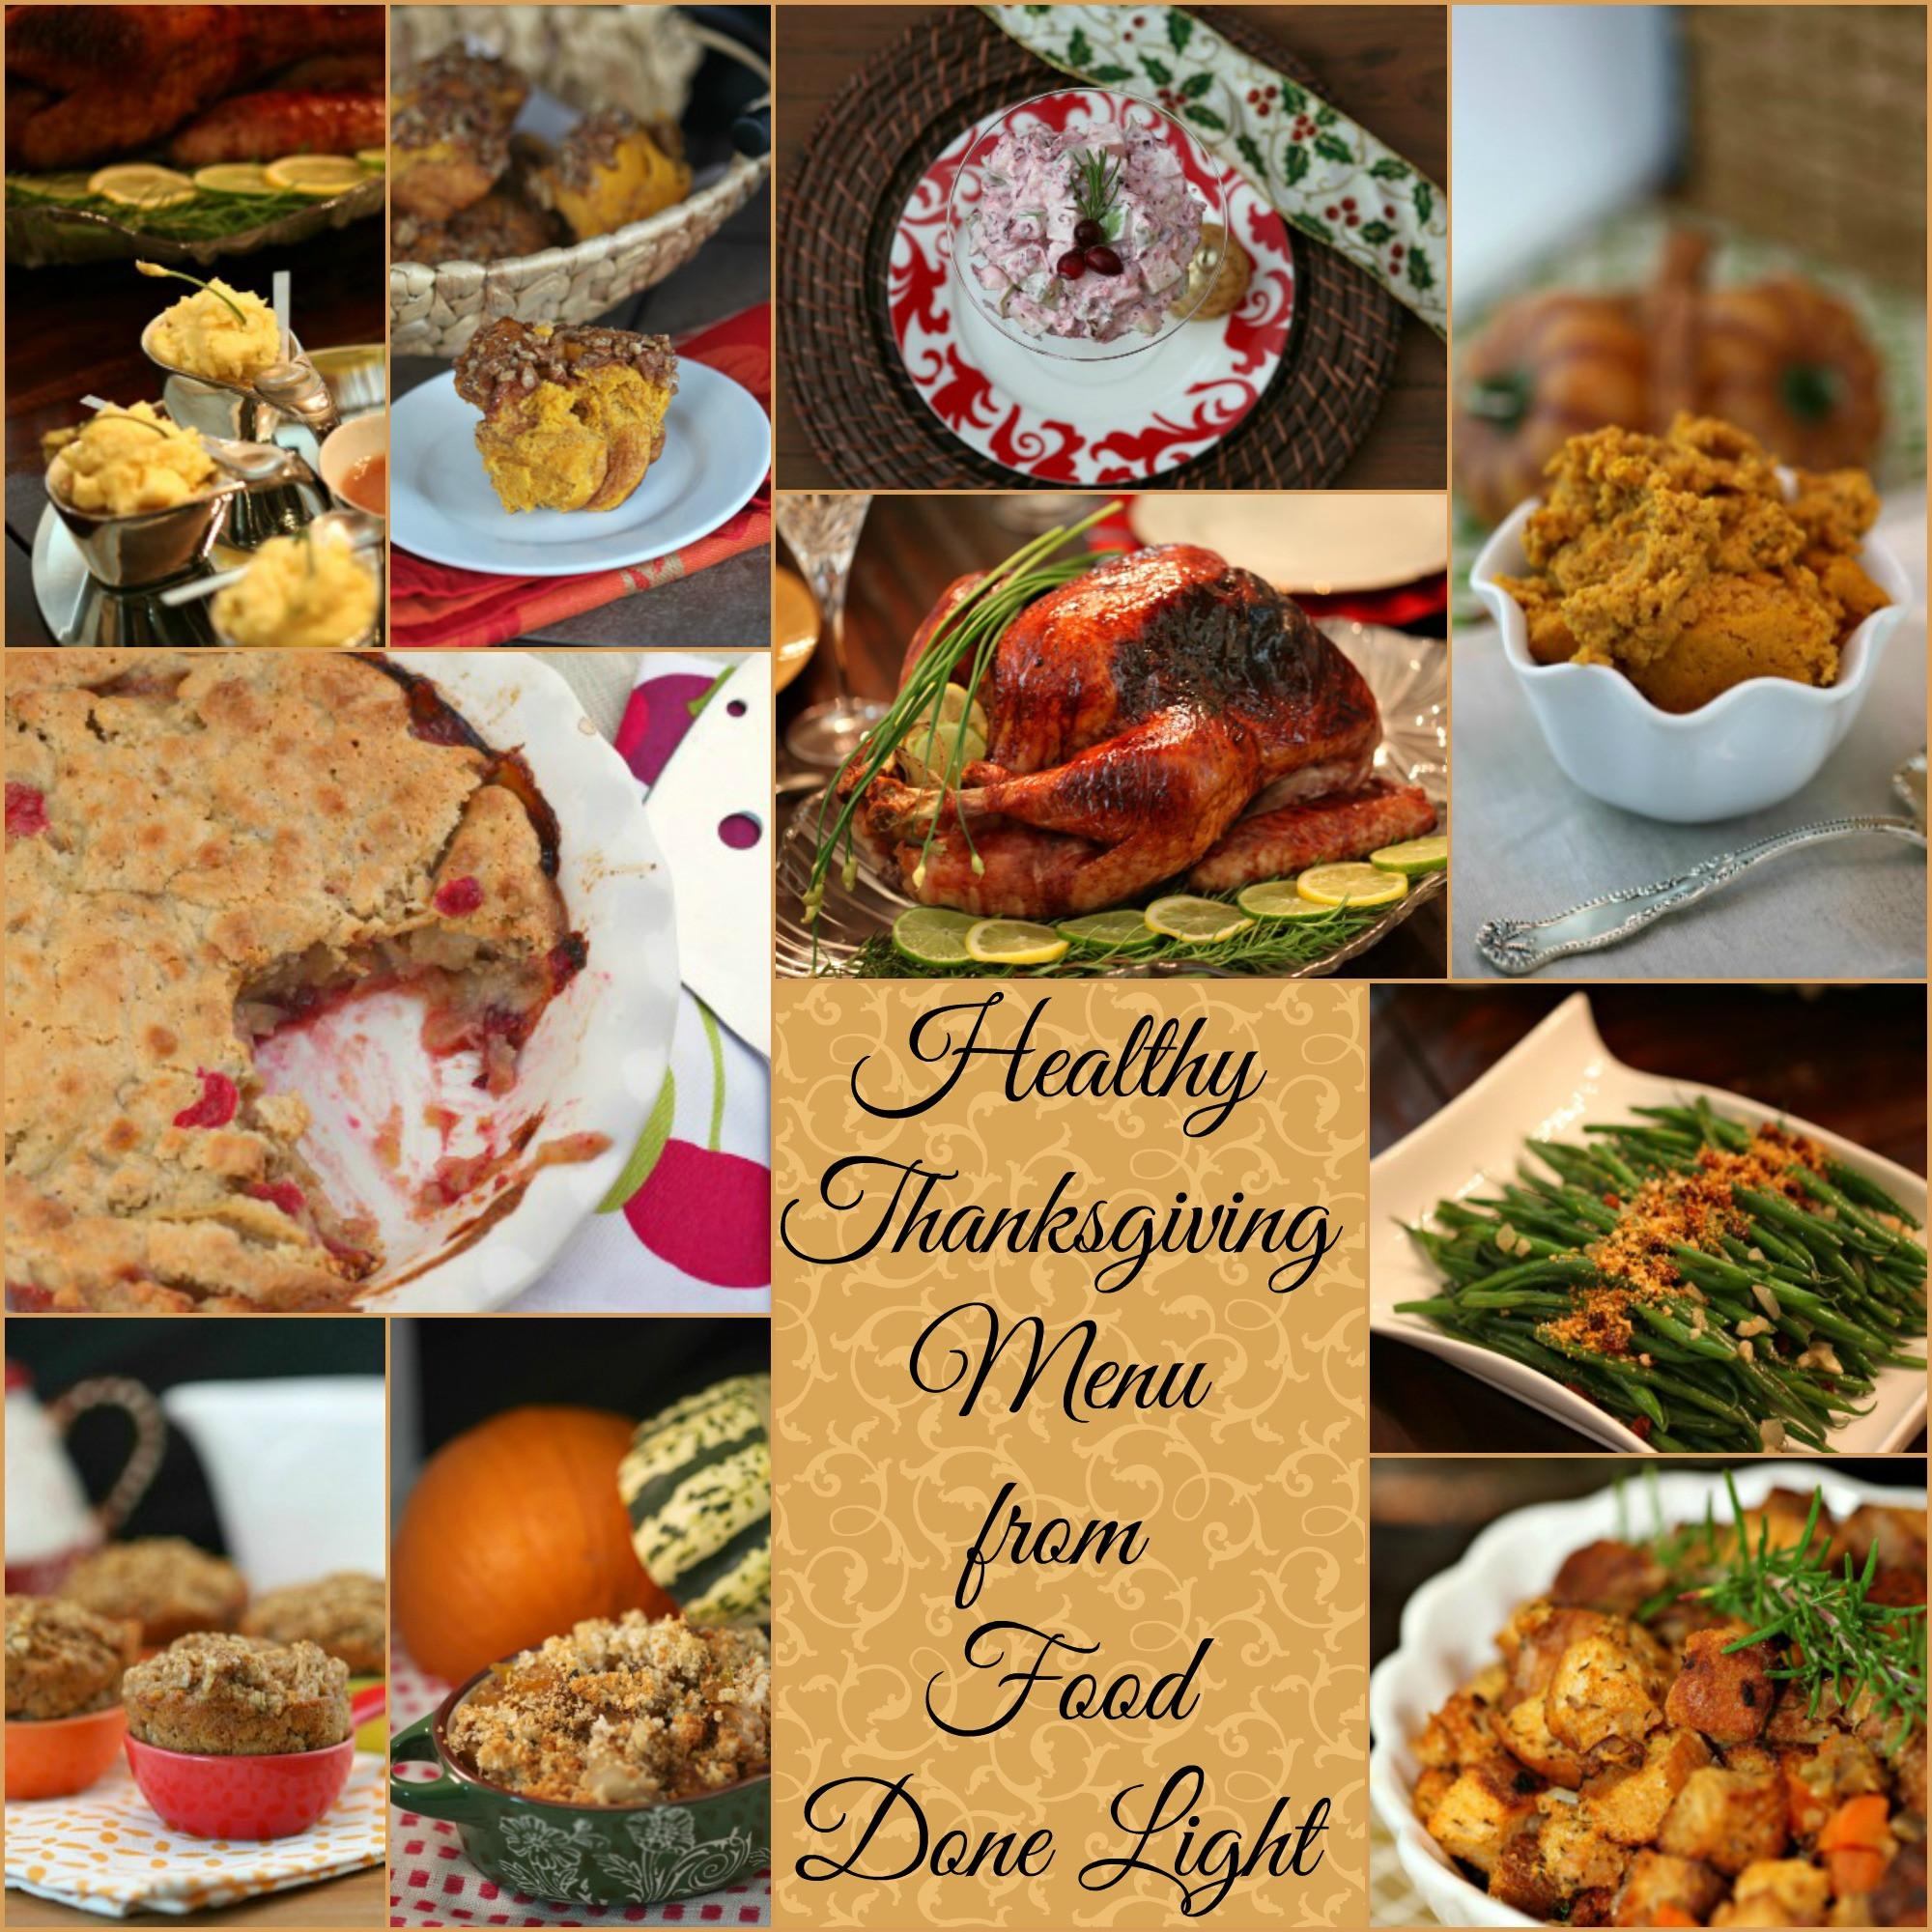 Healthy Thanksgiving Menu  Food Done Light s Healthy Thanksgiving Menu Food Done Light